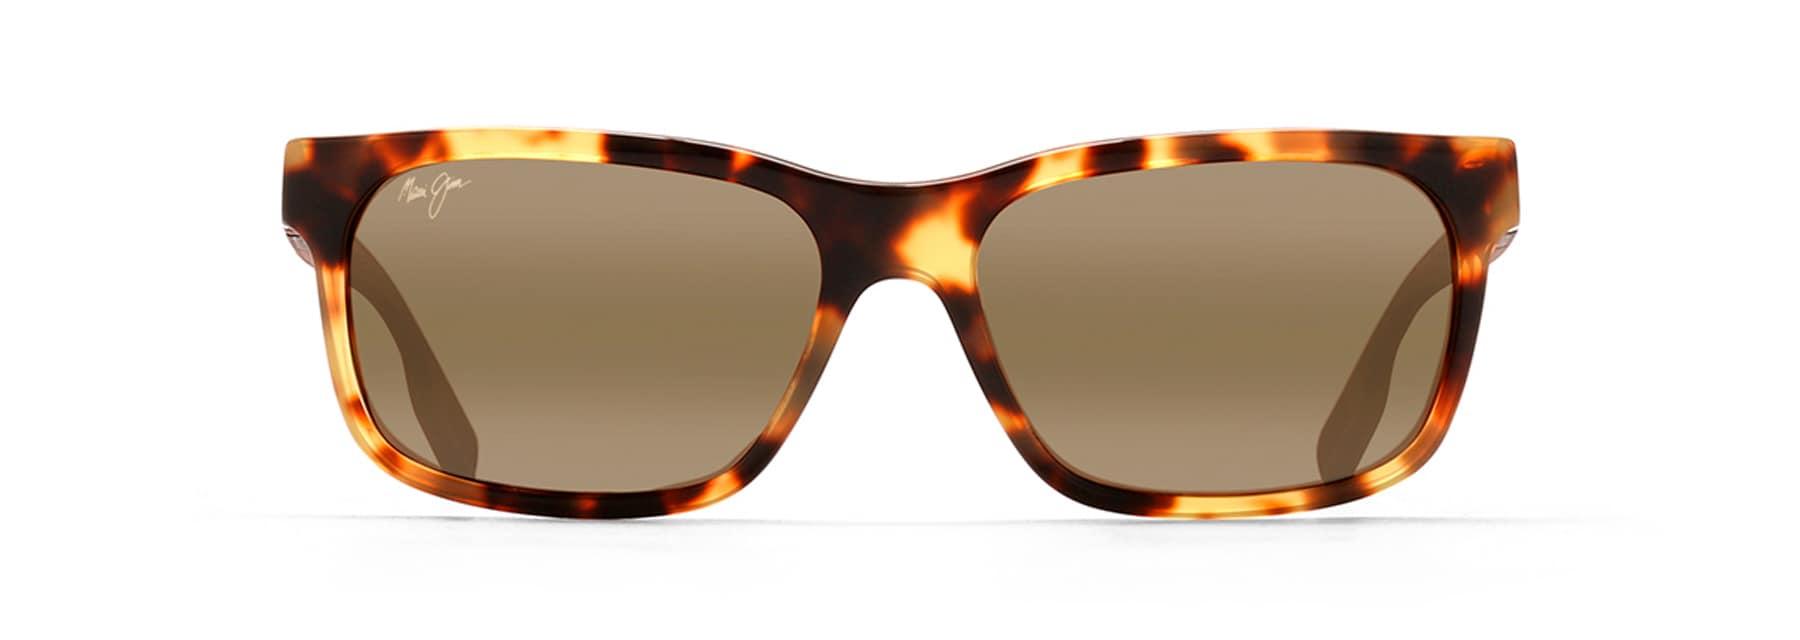 44fca7b968 Eh Brah Polarized Sunglasses